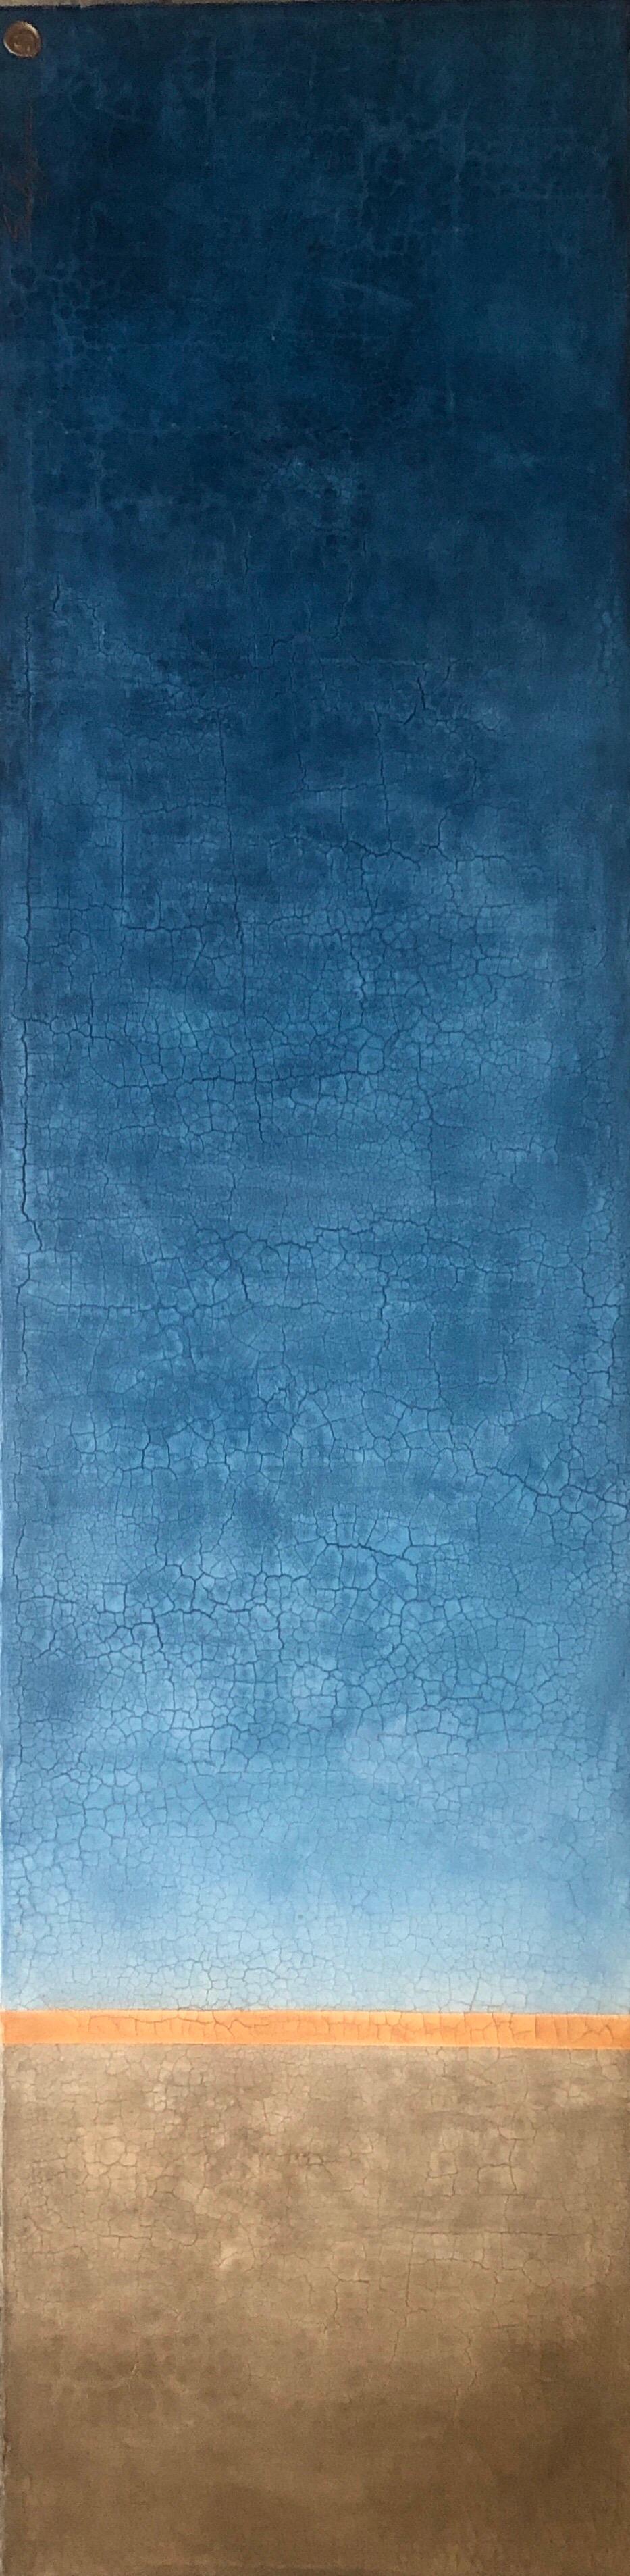 "Blue Orange Raw Amber Hues Minimalist Contemporary Mixed Media Painting 72""x18"""